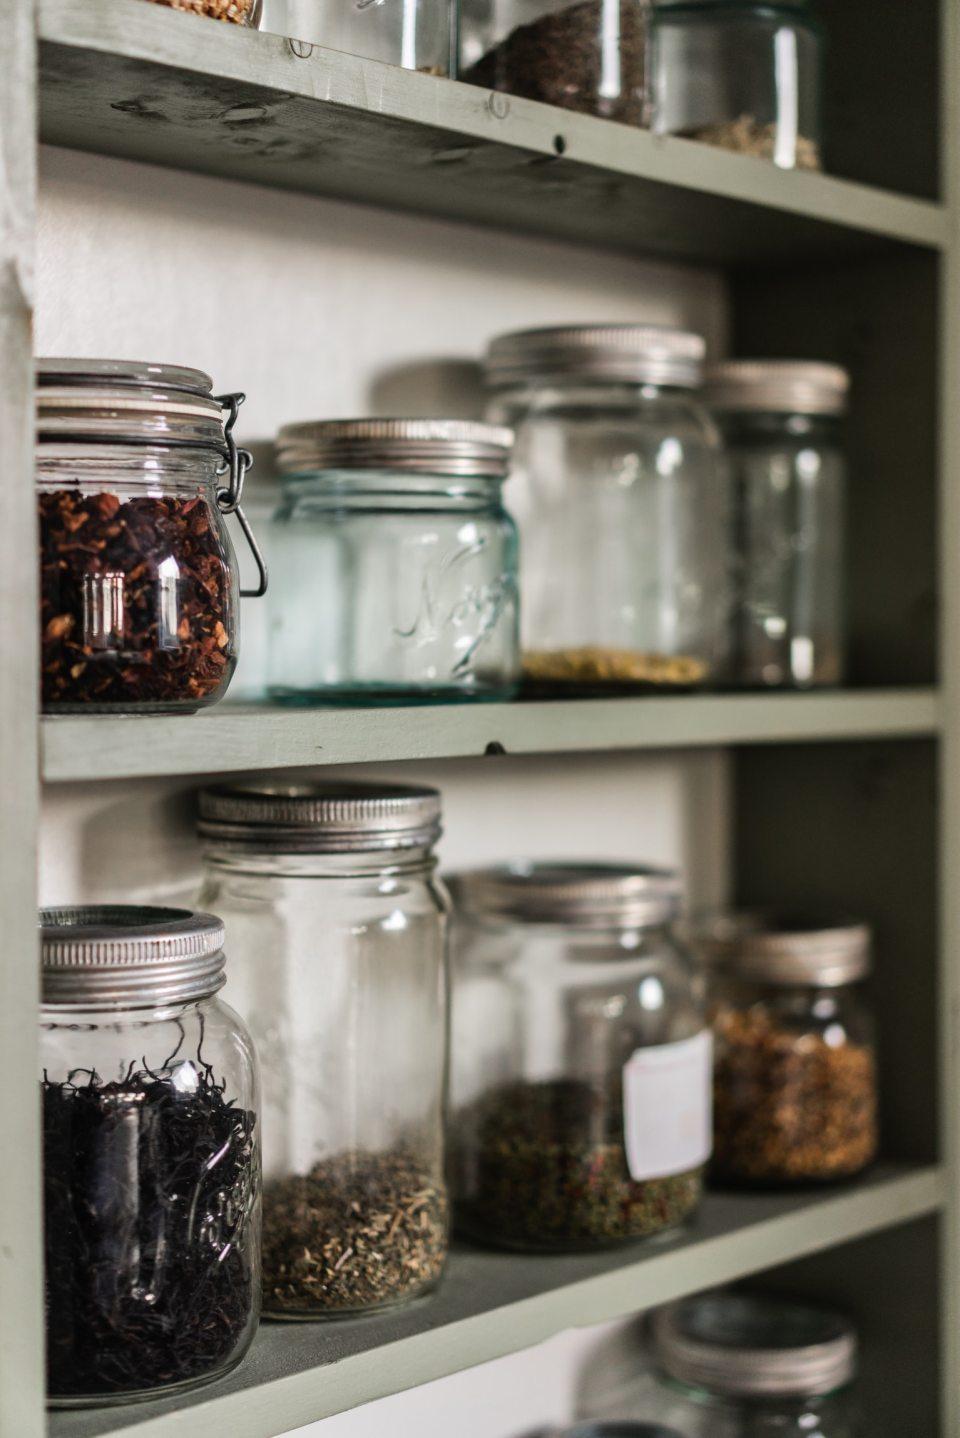 image of jars on a shelf